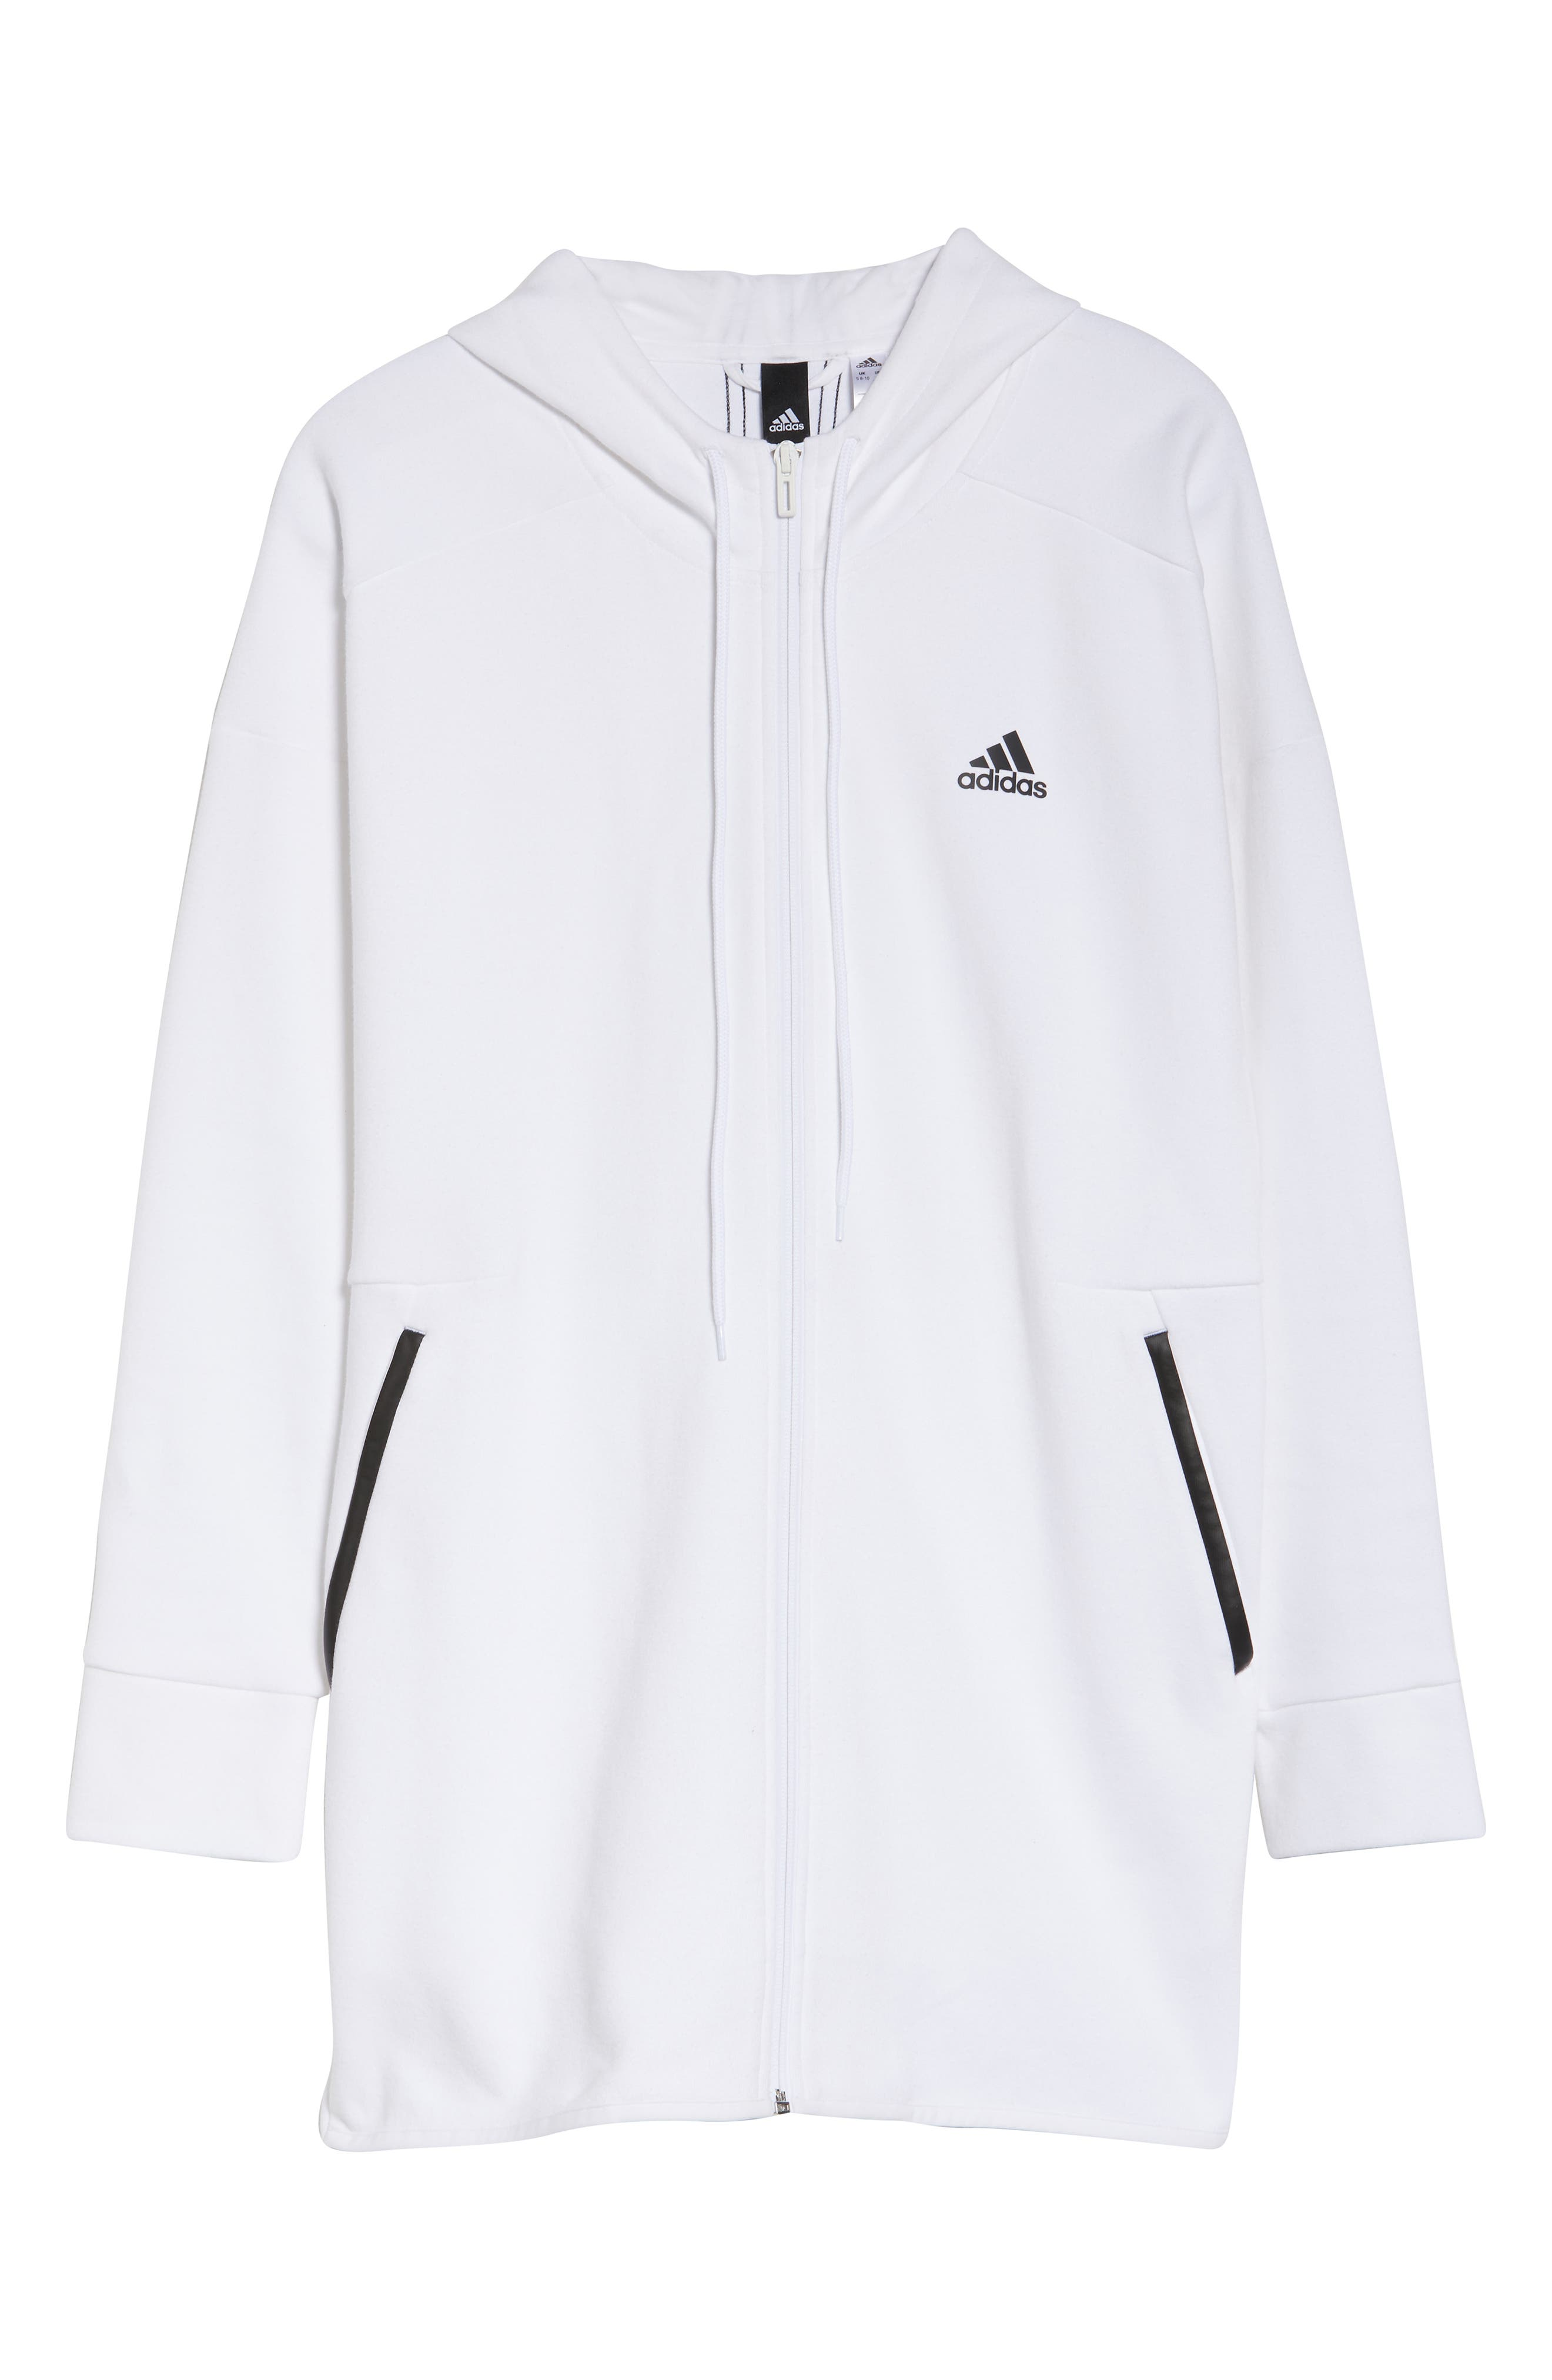 Adidas Originals Sst Jacke Orange Blanc Kinder Kleidung